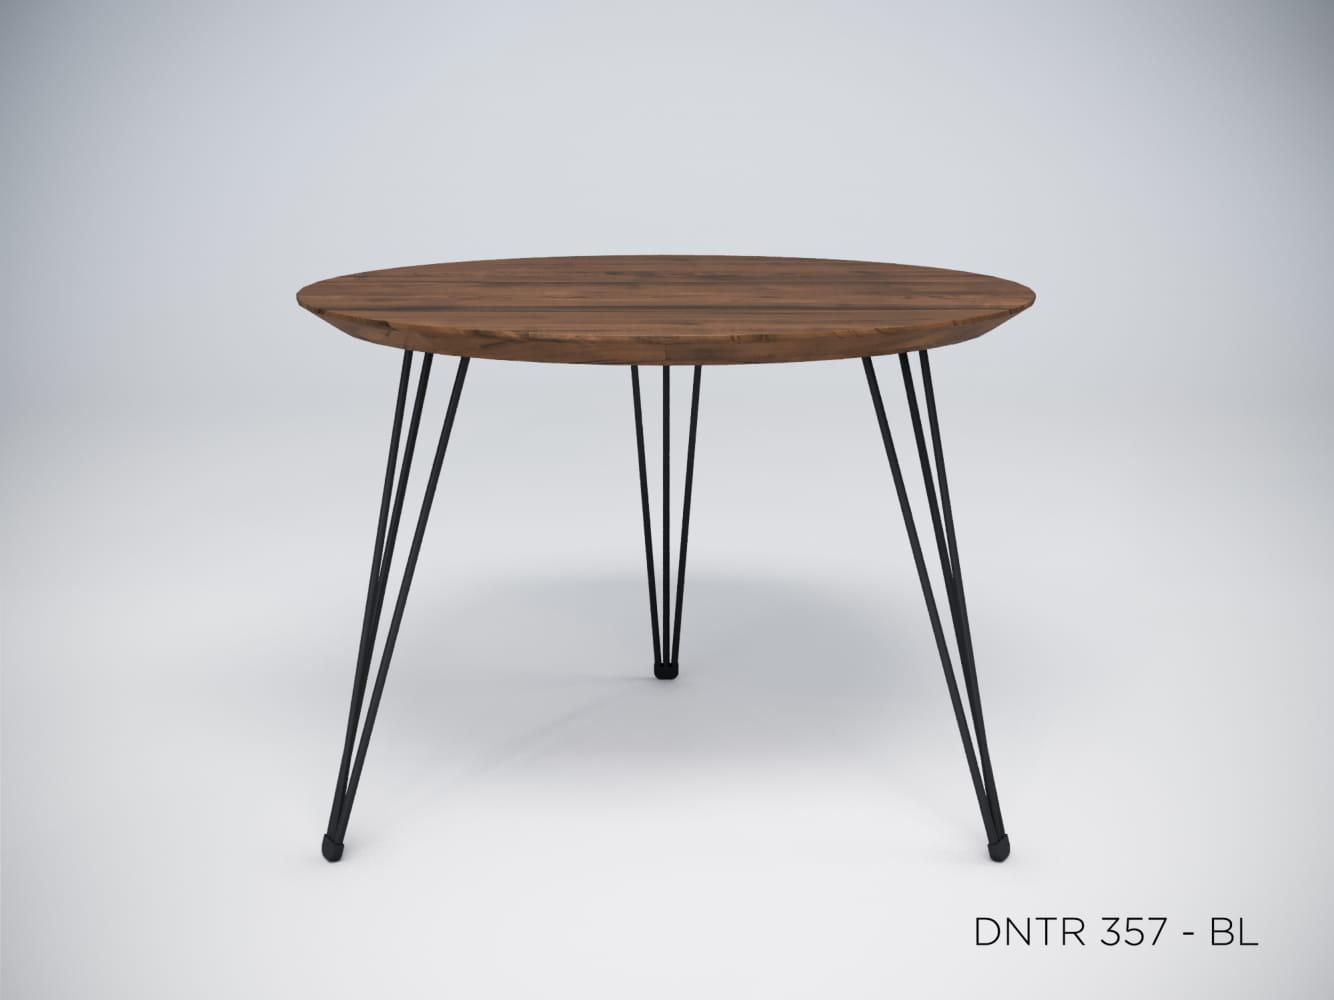 Dining table meja makan dnt 357